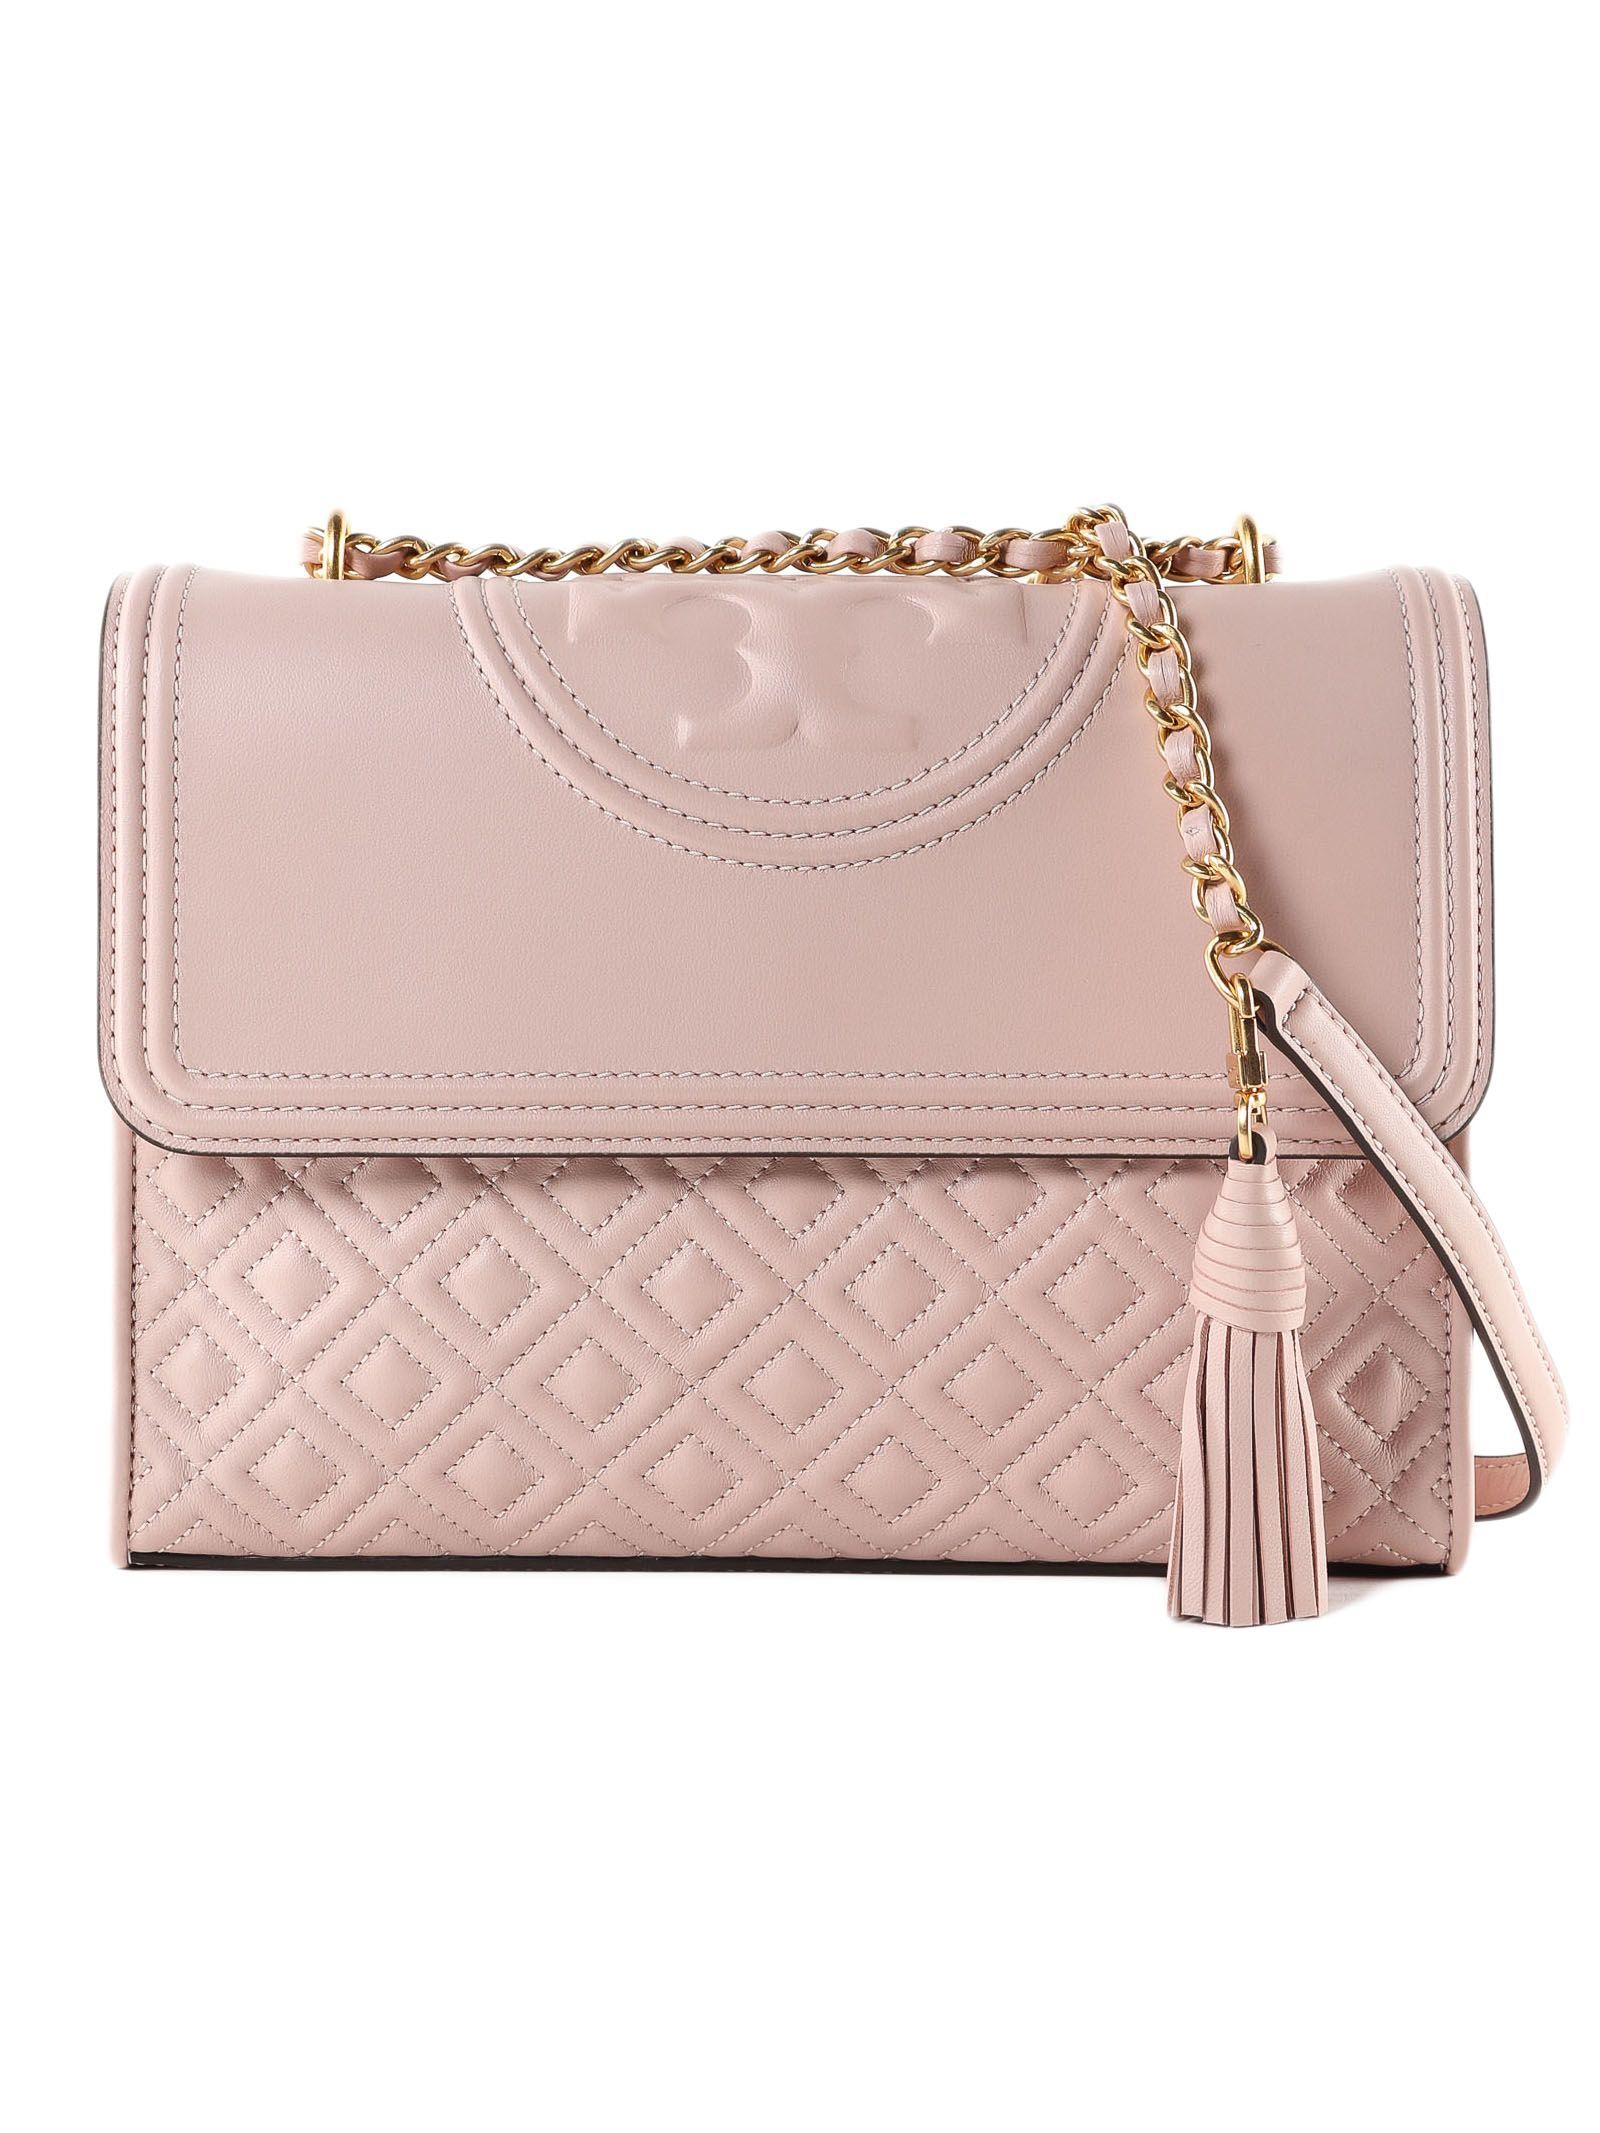 d2e224b7c9f Tory Burch Tory Burch Fleming Convertible Shoulder Bag - Shell Pink ...